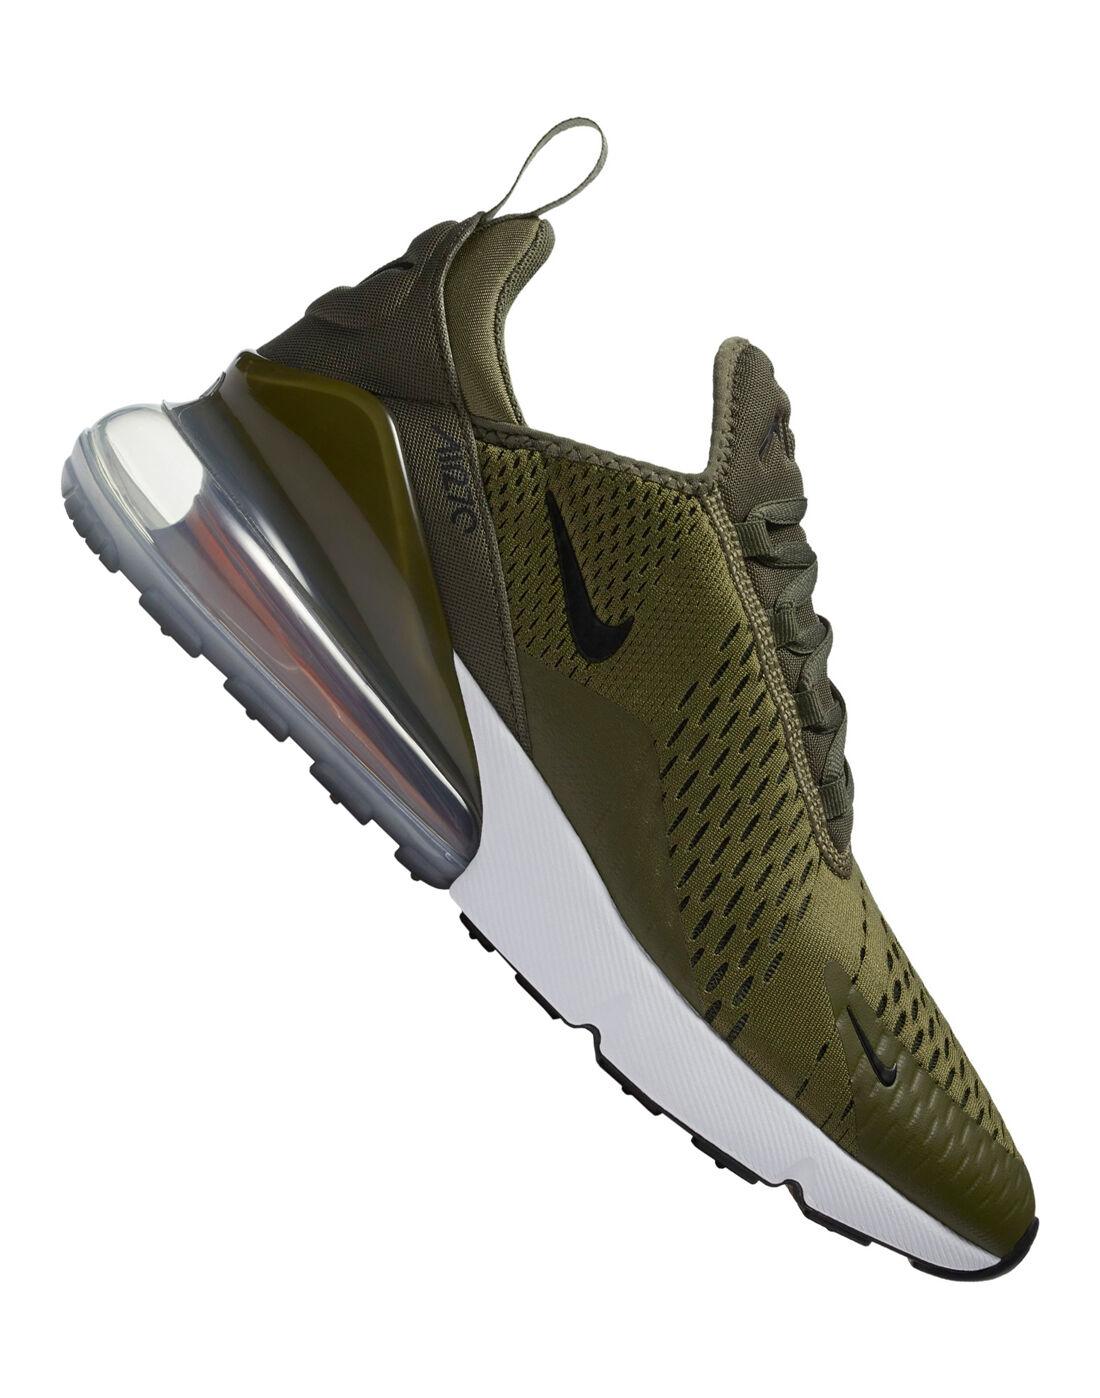 Men's Nike Air Max 270 Trainers   Green